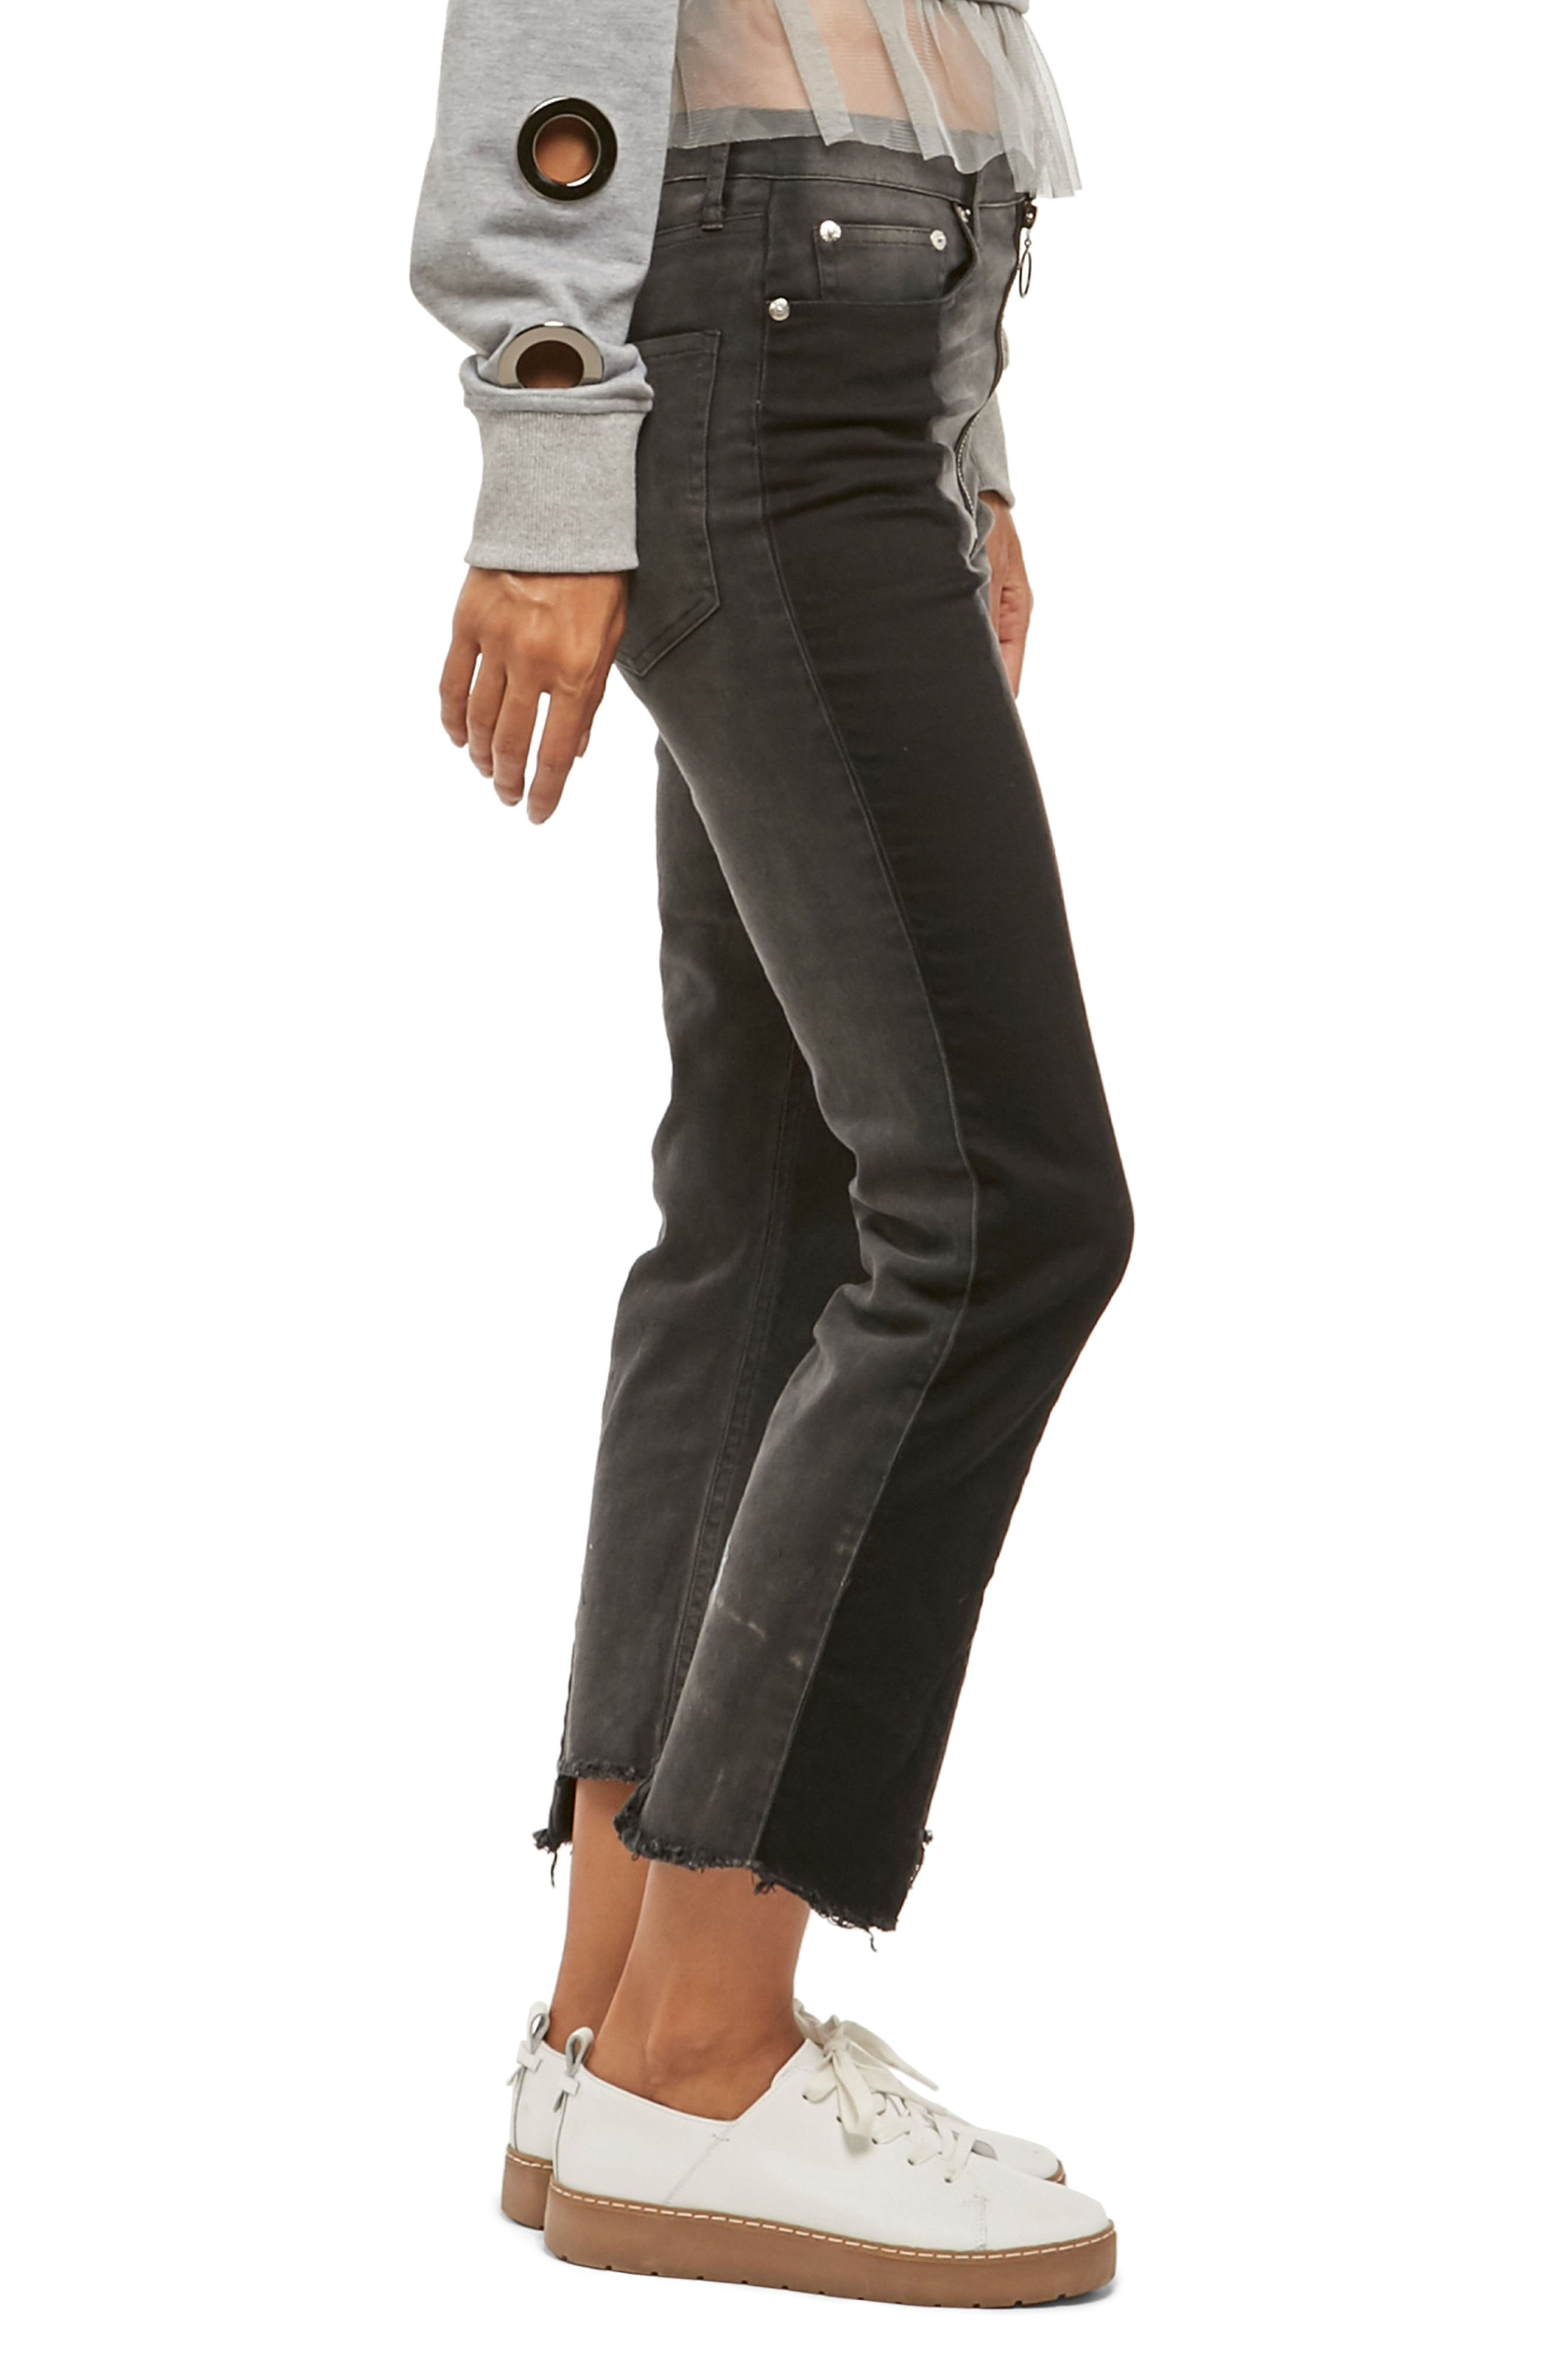 Alpha & Omega Two-Tone Crop Jeans,                             Alternate thumbnail 3, color,                             Black